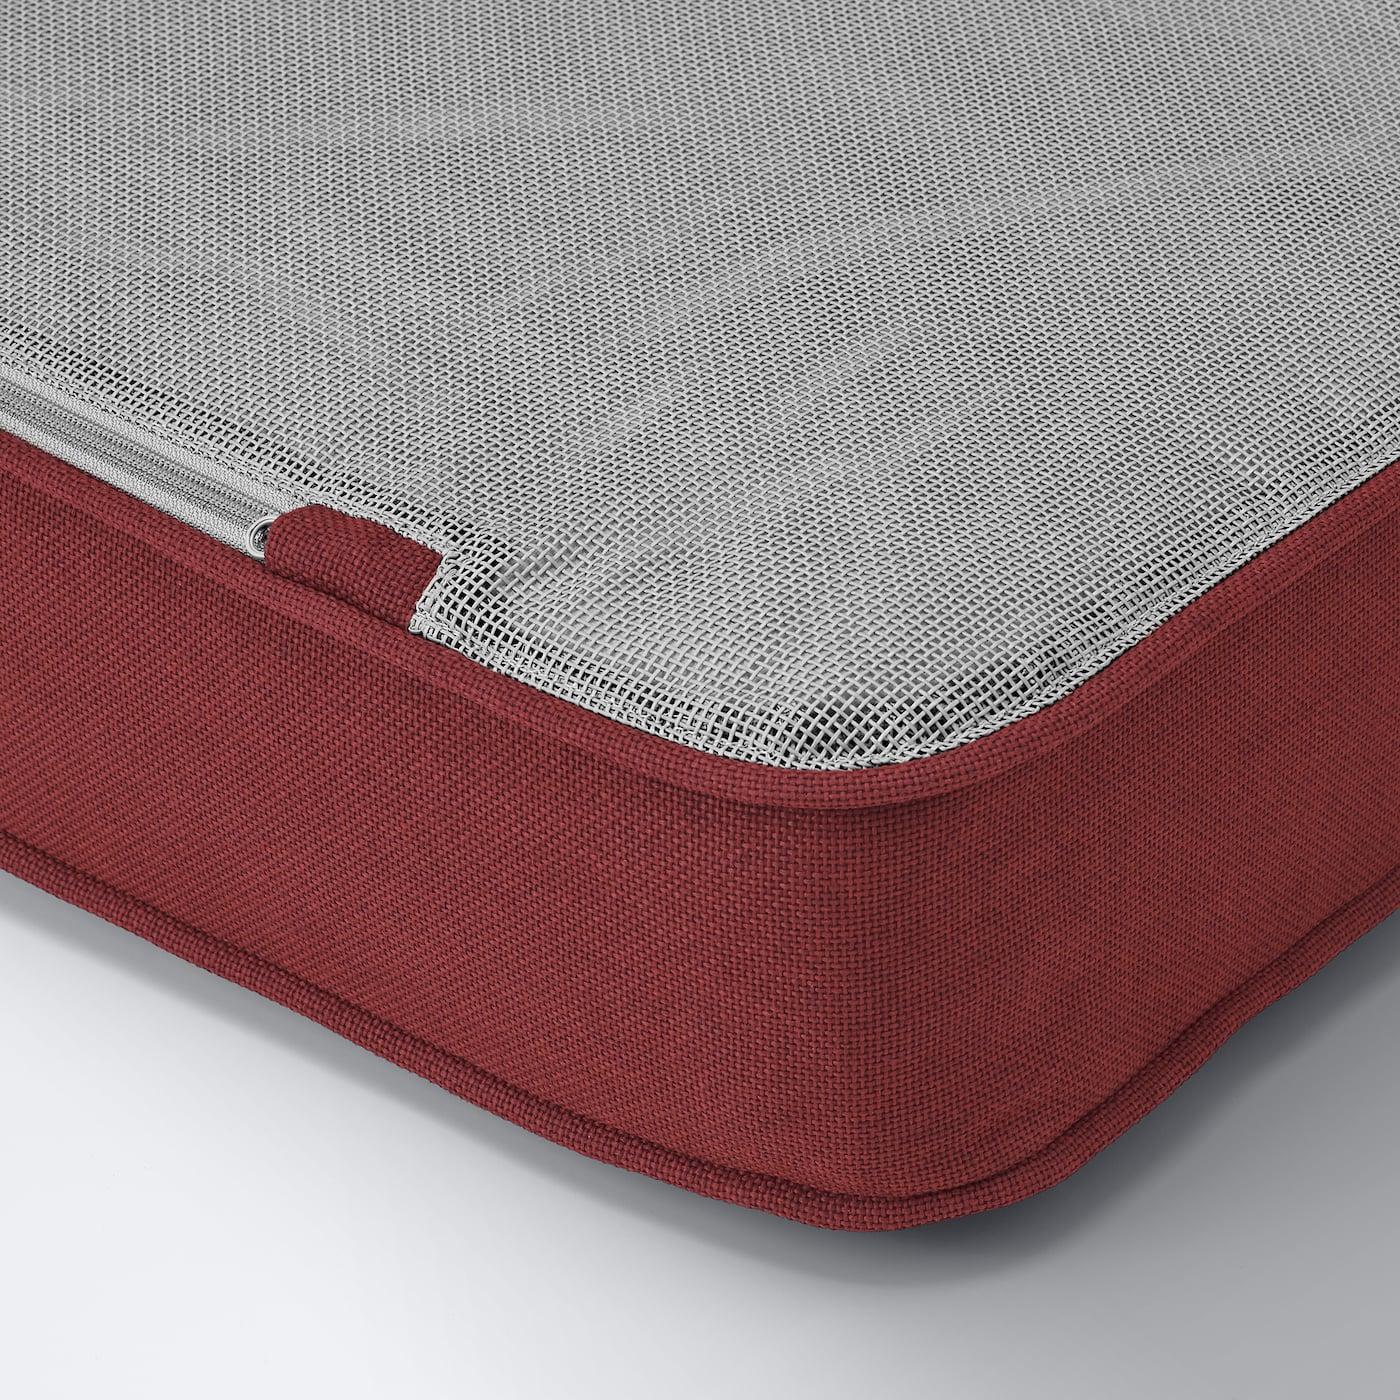 ÄPPLARÖ Sessel/außen, braun las./Järpön/Duvholmen braunrot, 63x80x86 cm